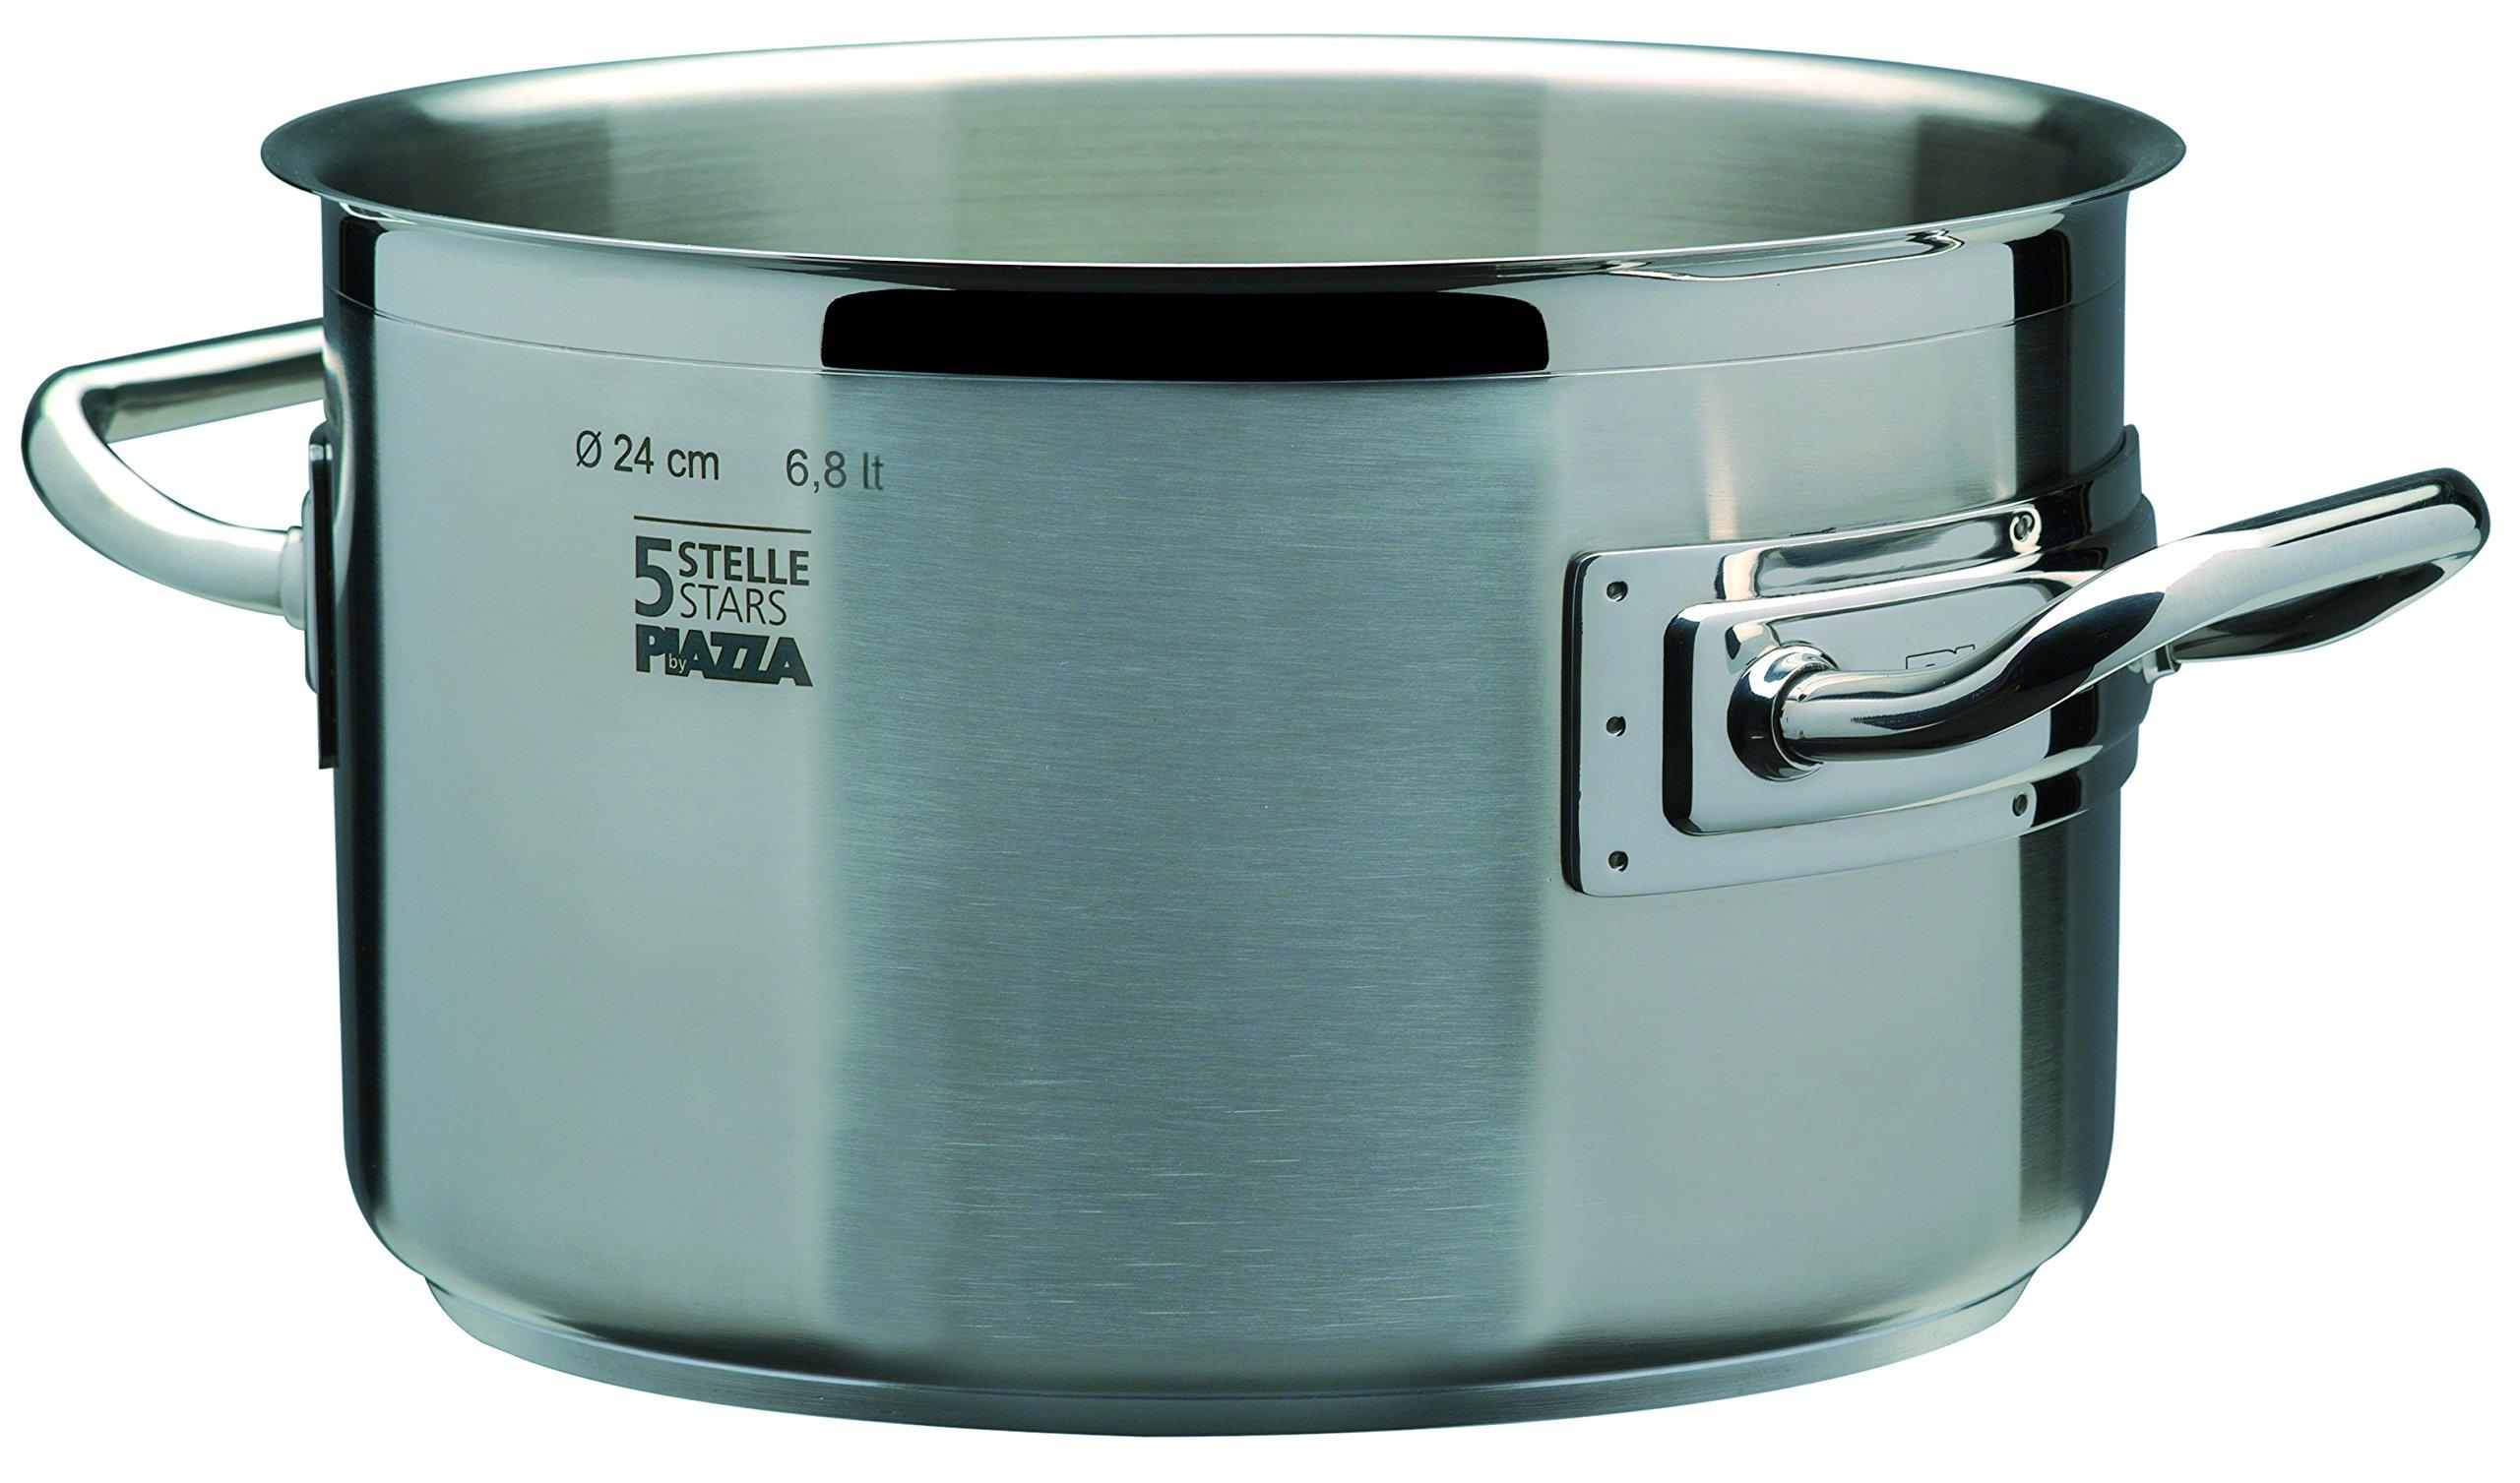 Piazza High casserole Collection 5 stars d. 20 cm - h. 13 cm - 410 cl 090420